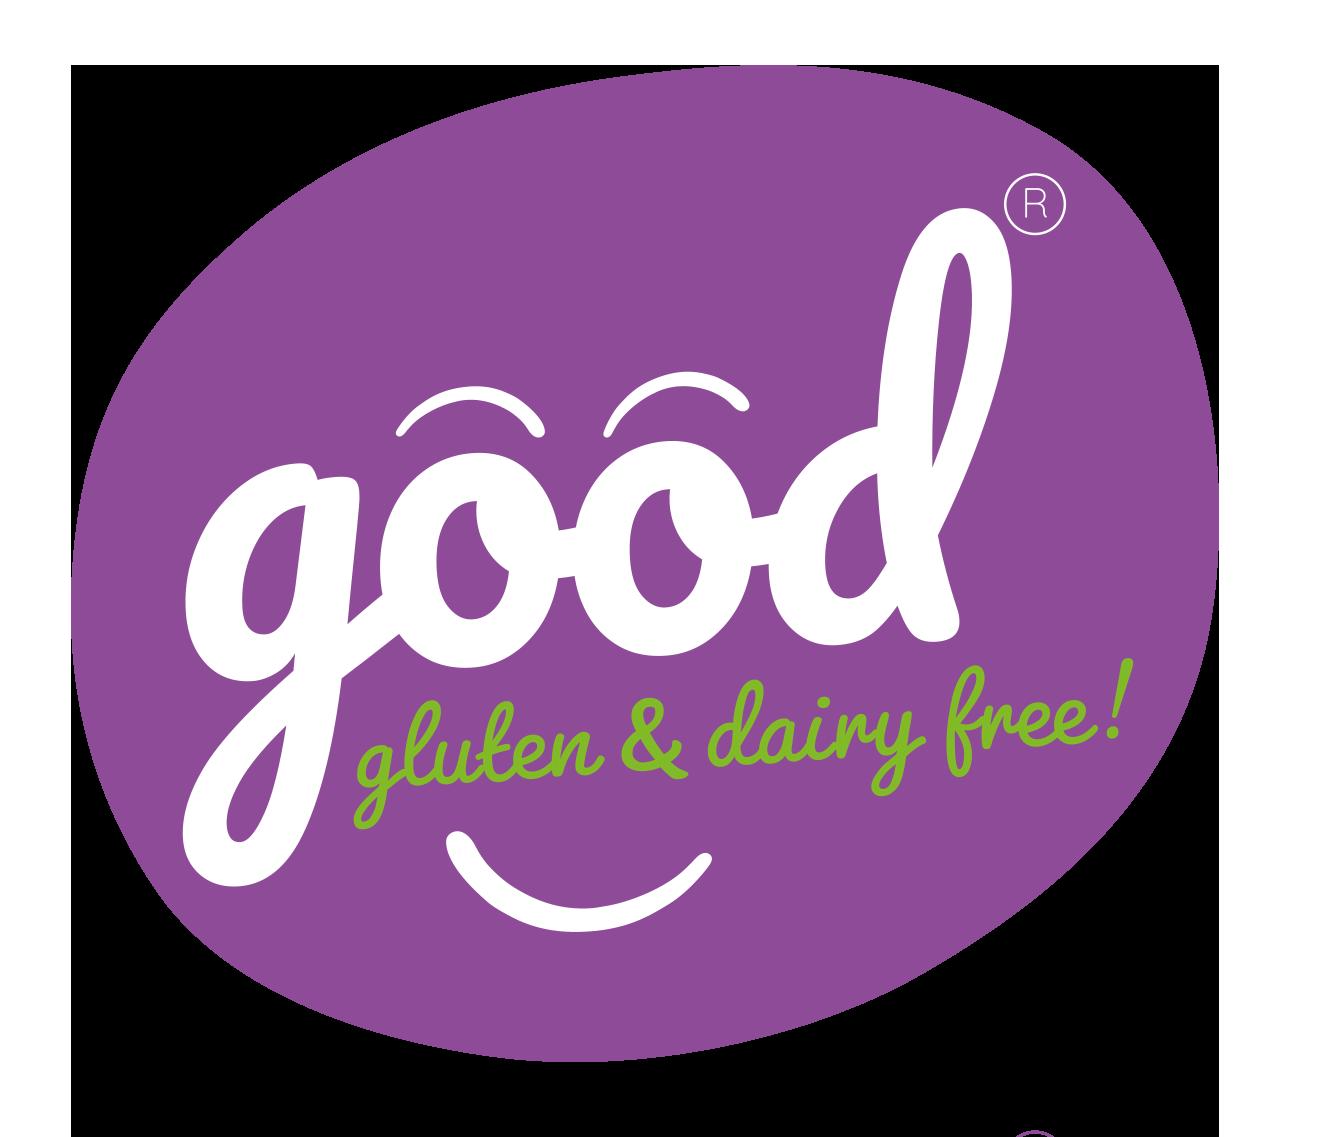 Good It's Gluten Free logo